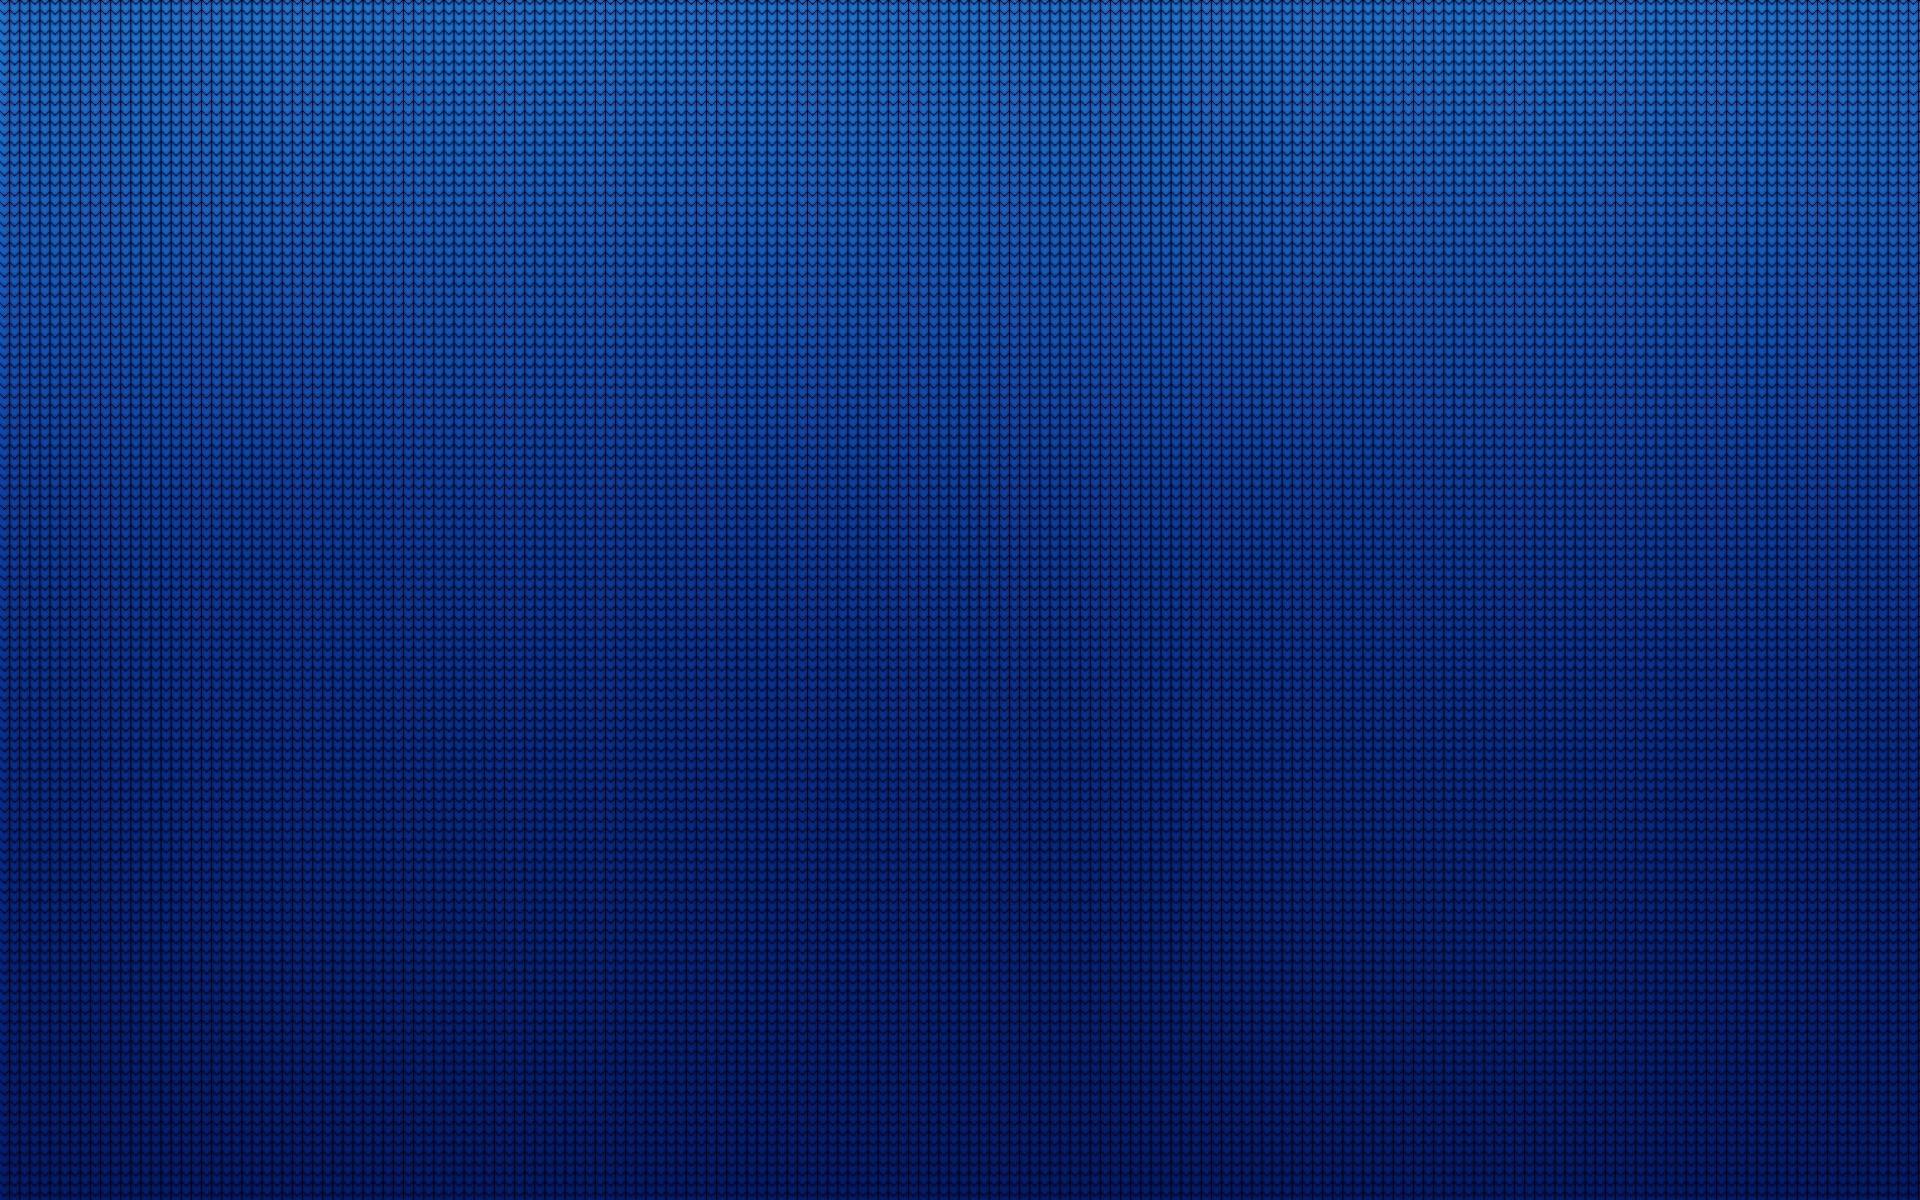 Plain Website Backgrounds Plain Backgrounds Dark Blue 1920x1200